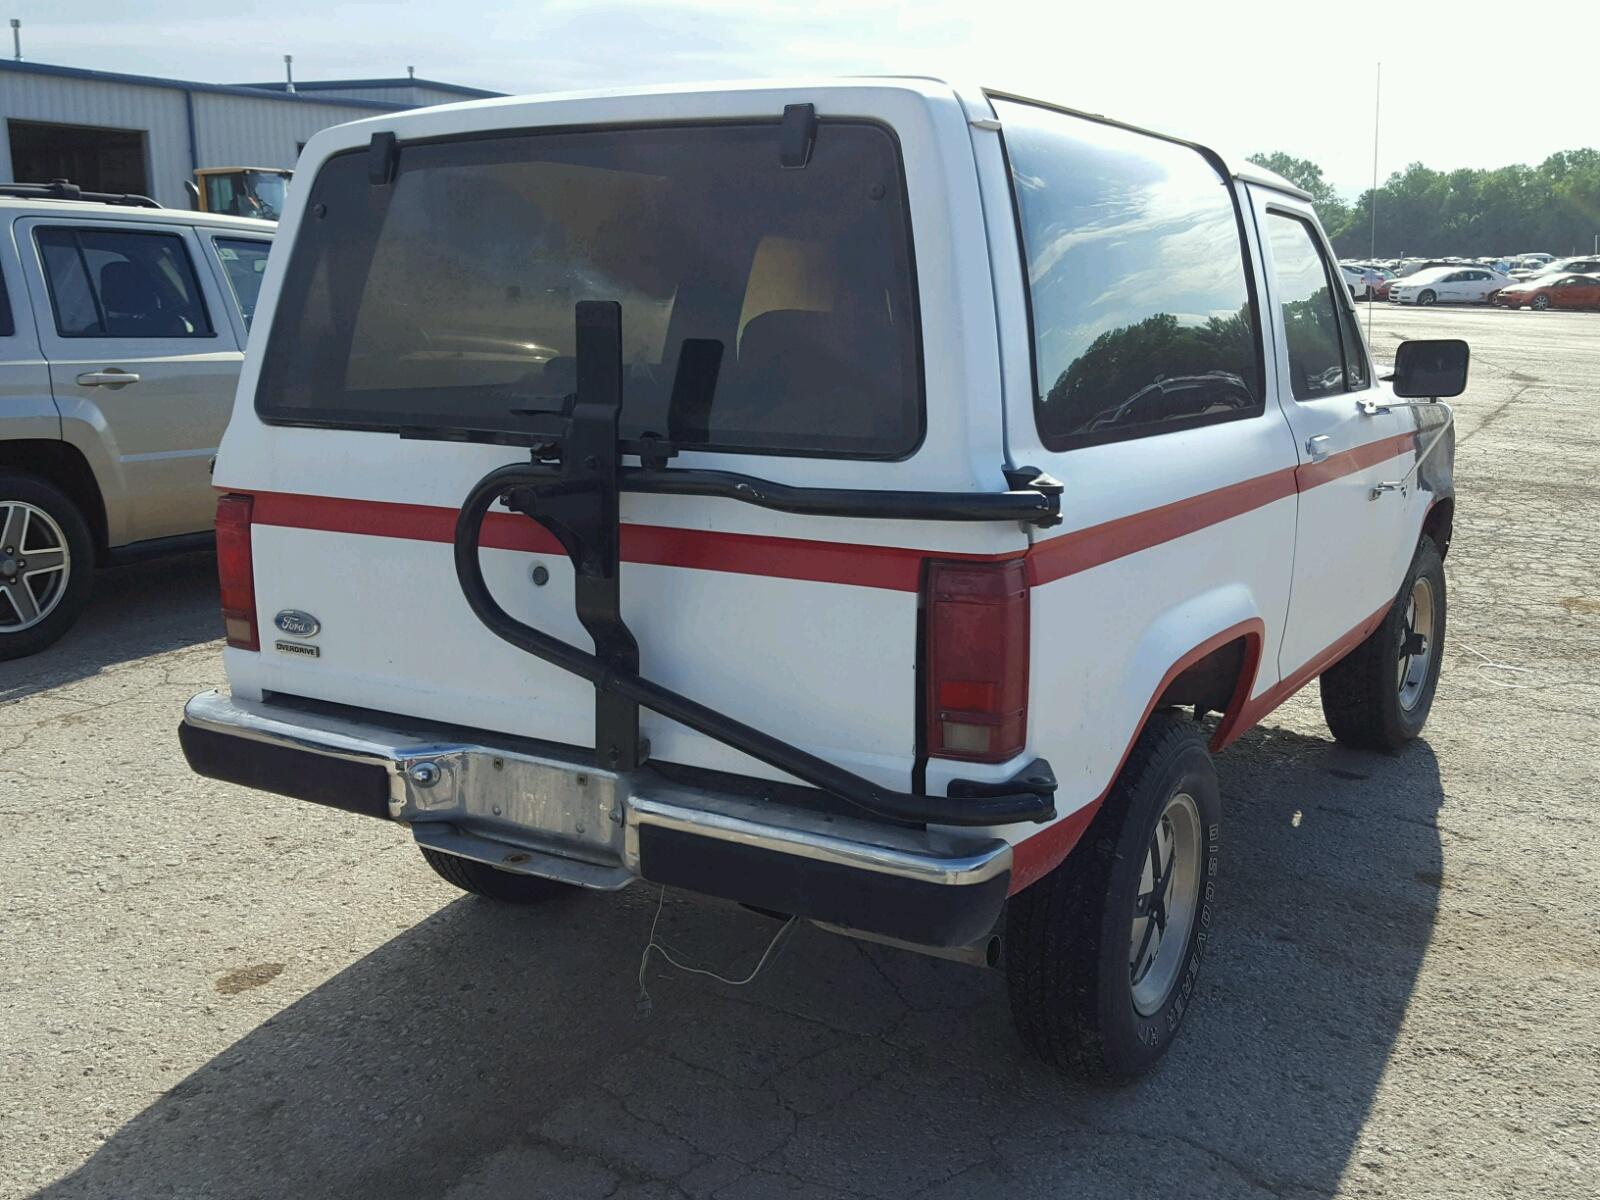 1986 Ford Bronco Ii 29l 6 In Ks Kansas City 1fmcu14t5gud22367 Fuel System Rear View